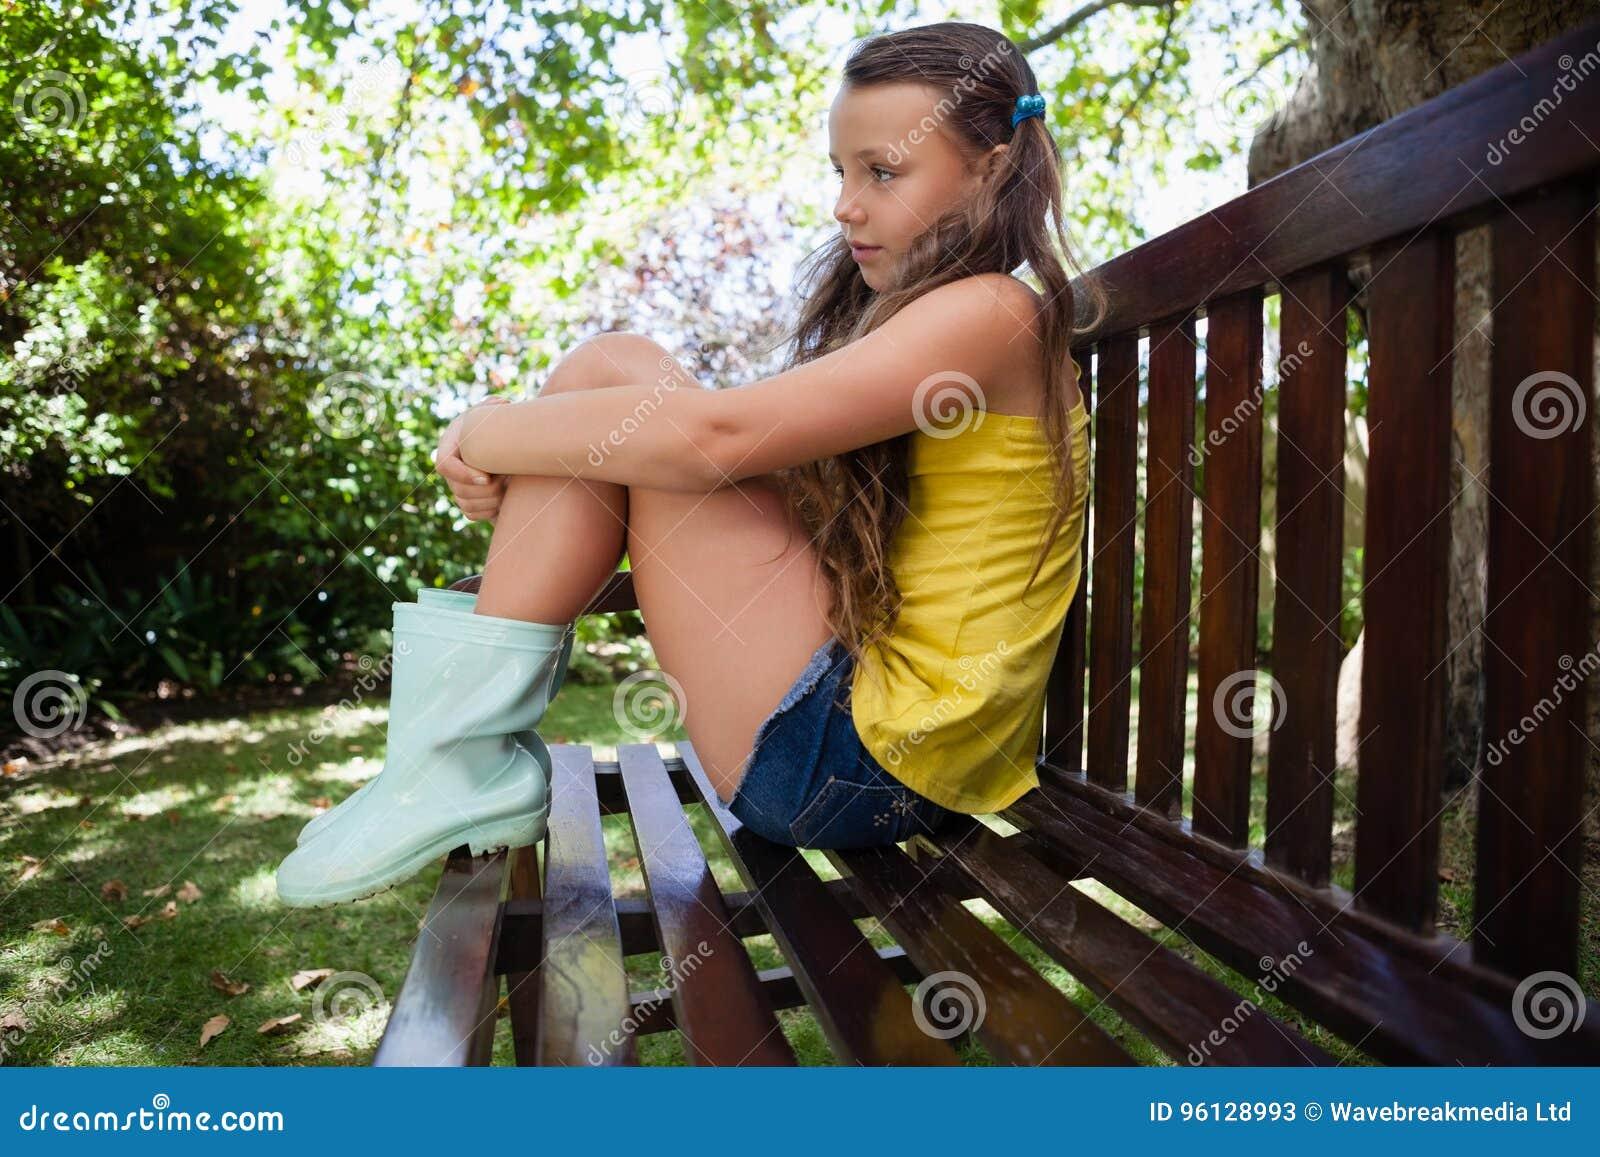 Девушка сидит на роже у подружки